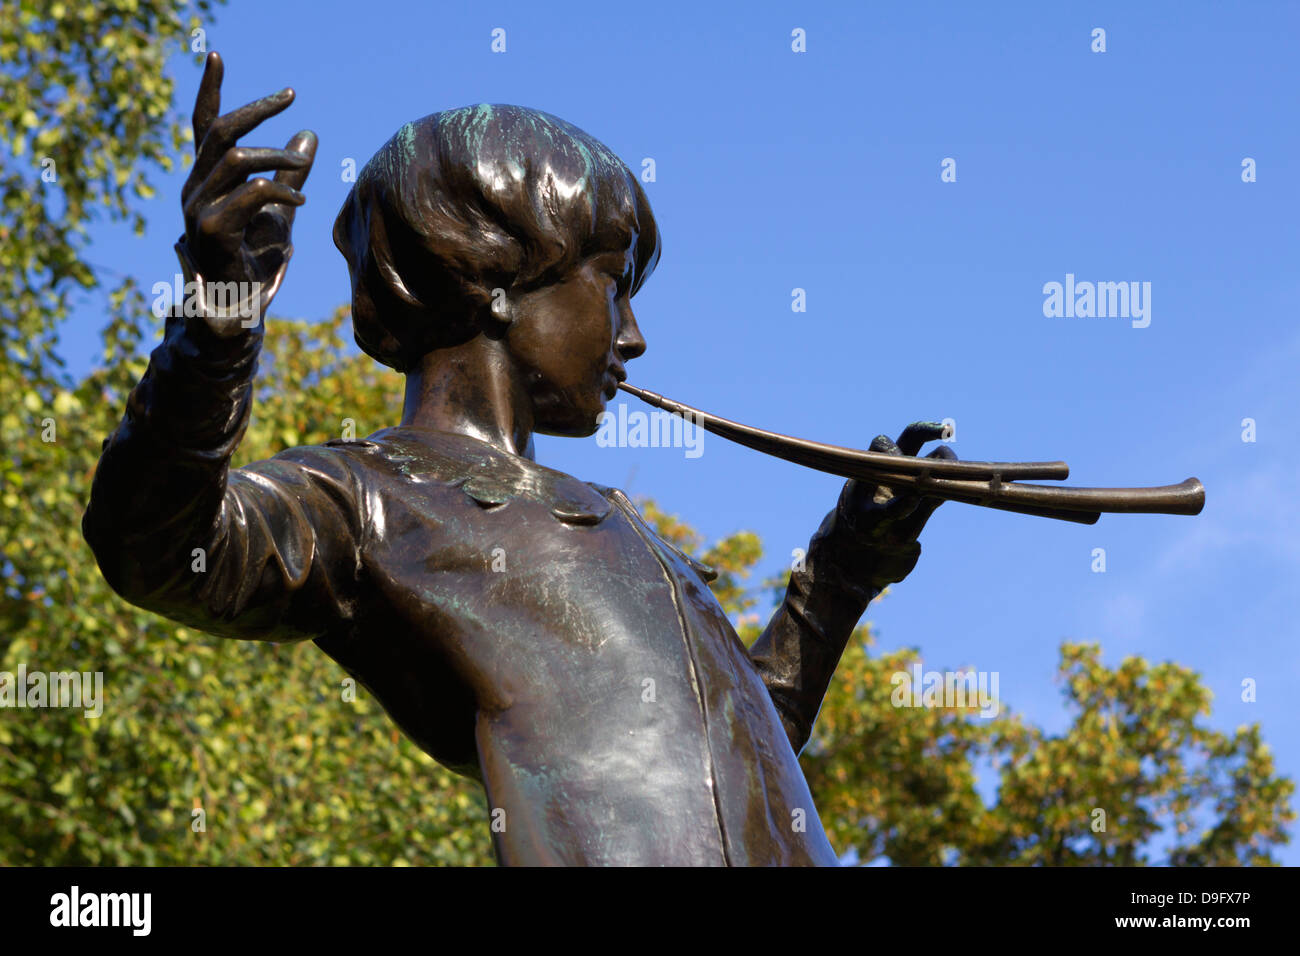 Statue of Peter Pan, Kensington Gardens, London, England, UK - Stock Image